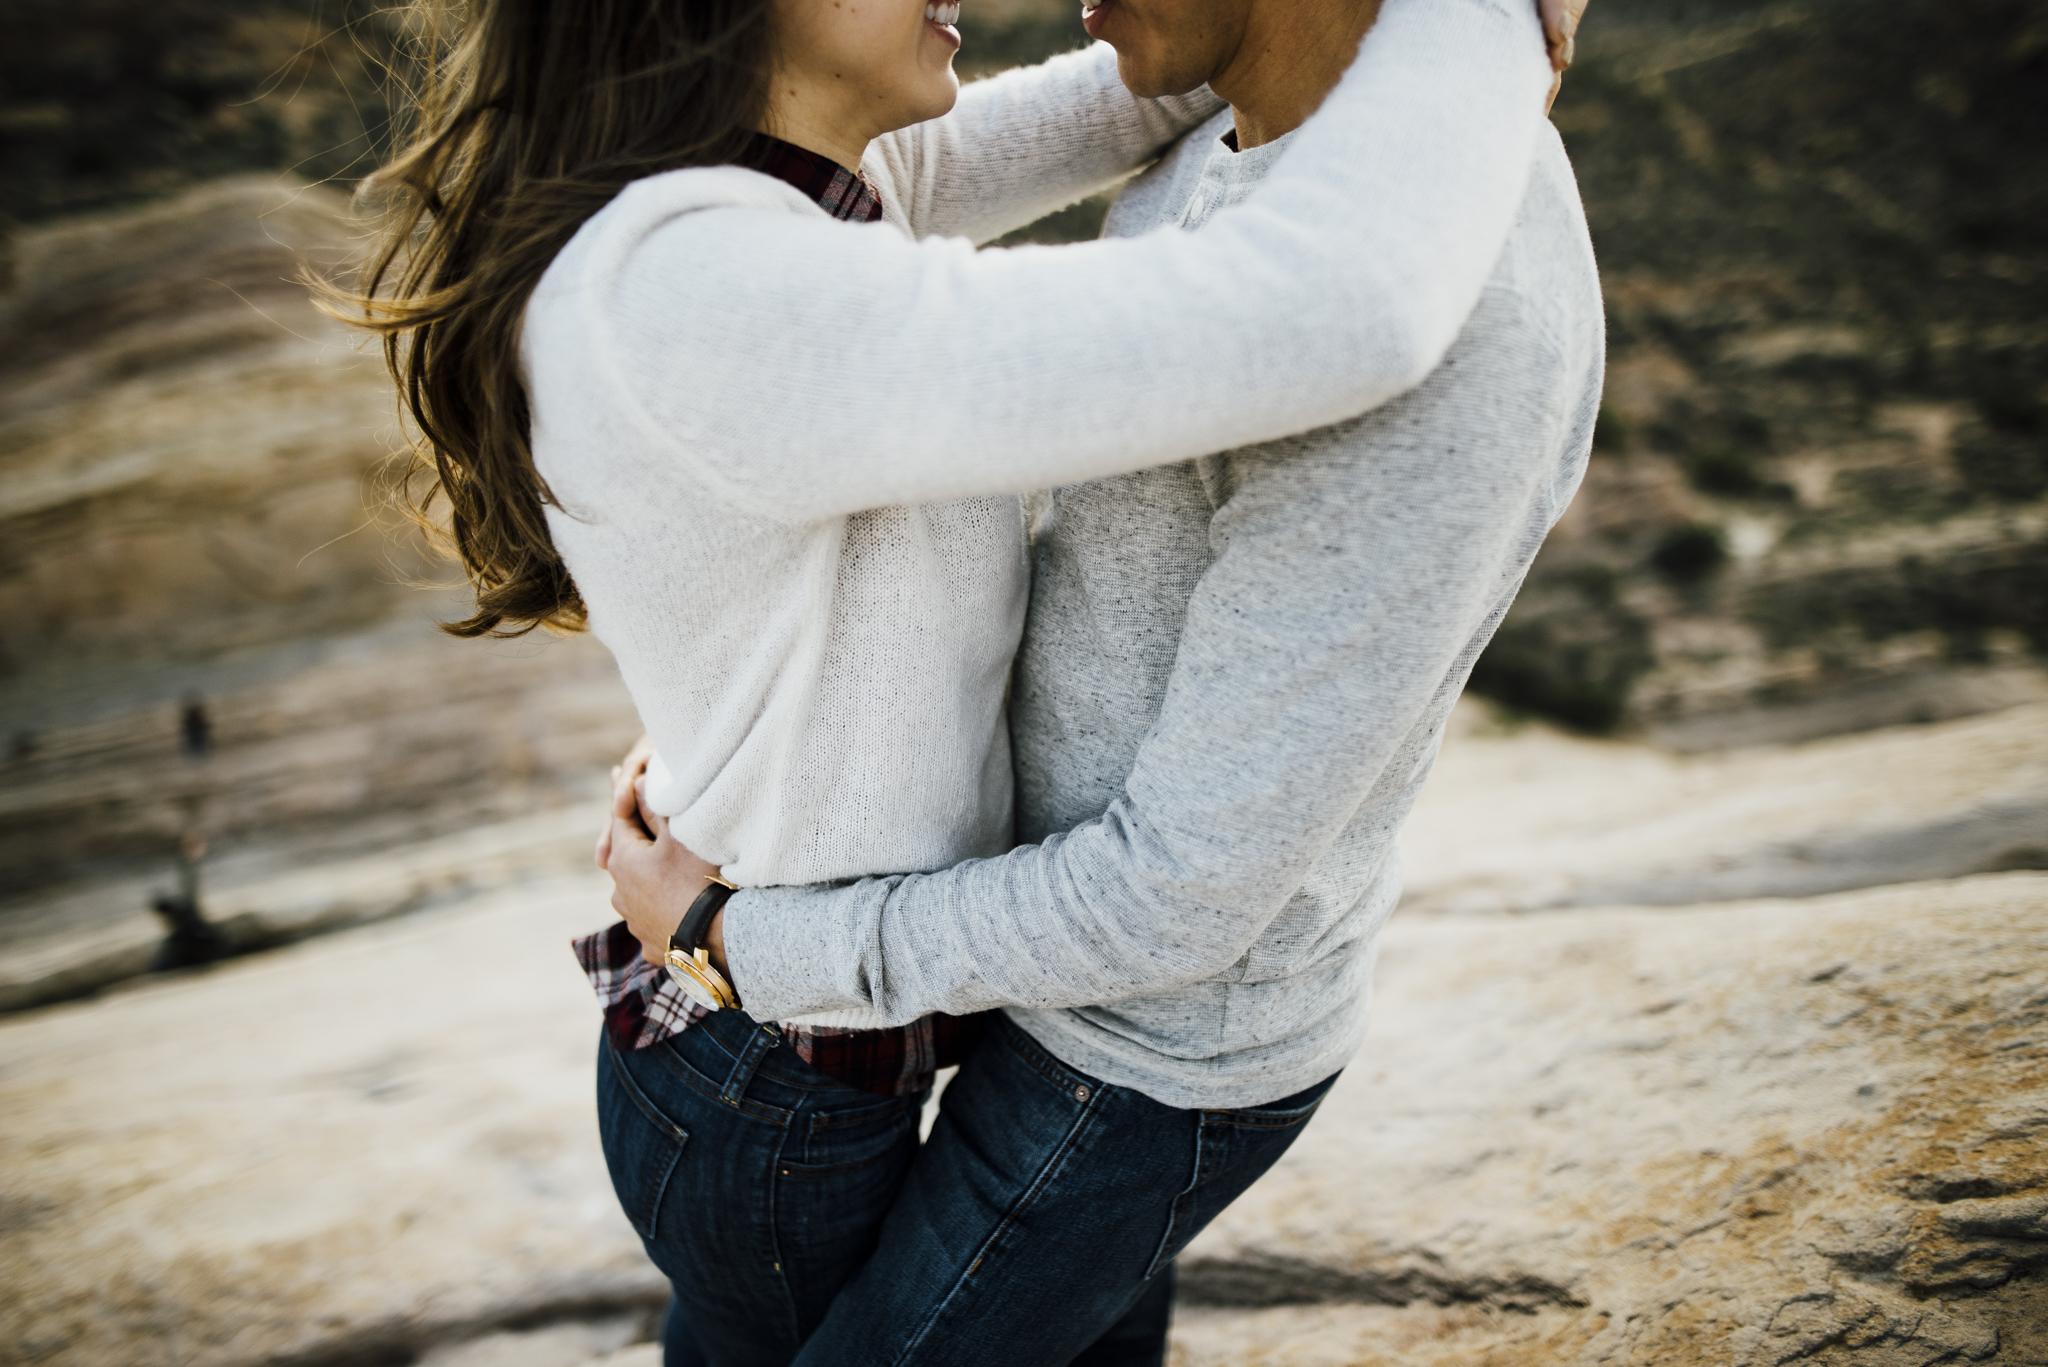 ©Isaiah-&-Taylor-Photography---Vasquez-Rocks-Engagement-024.jpg